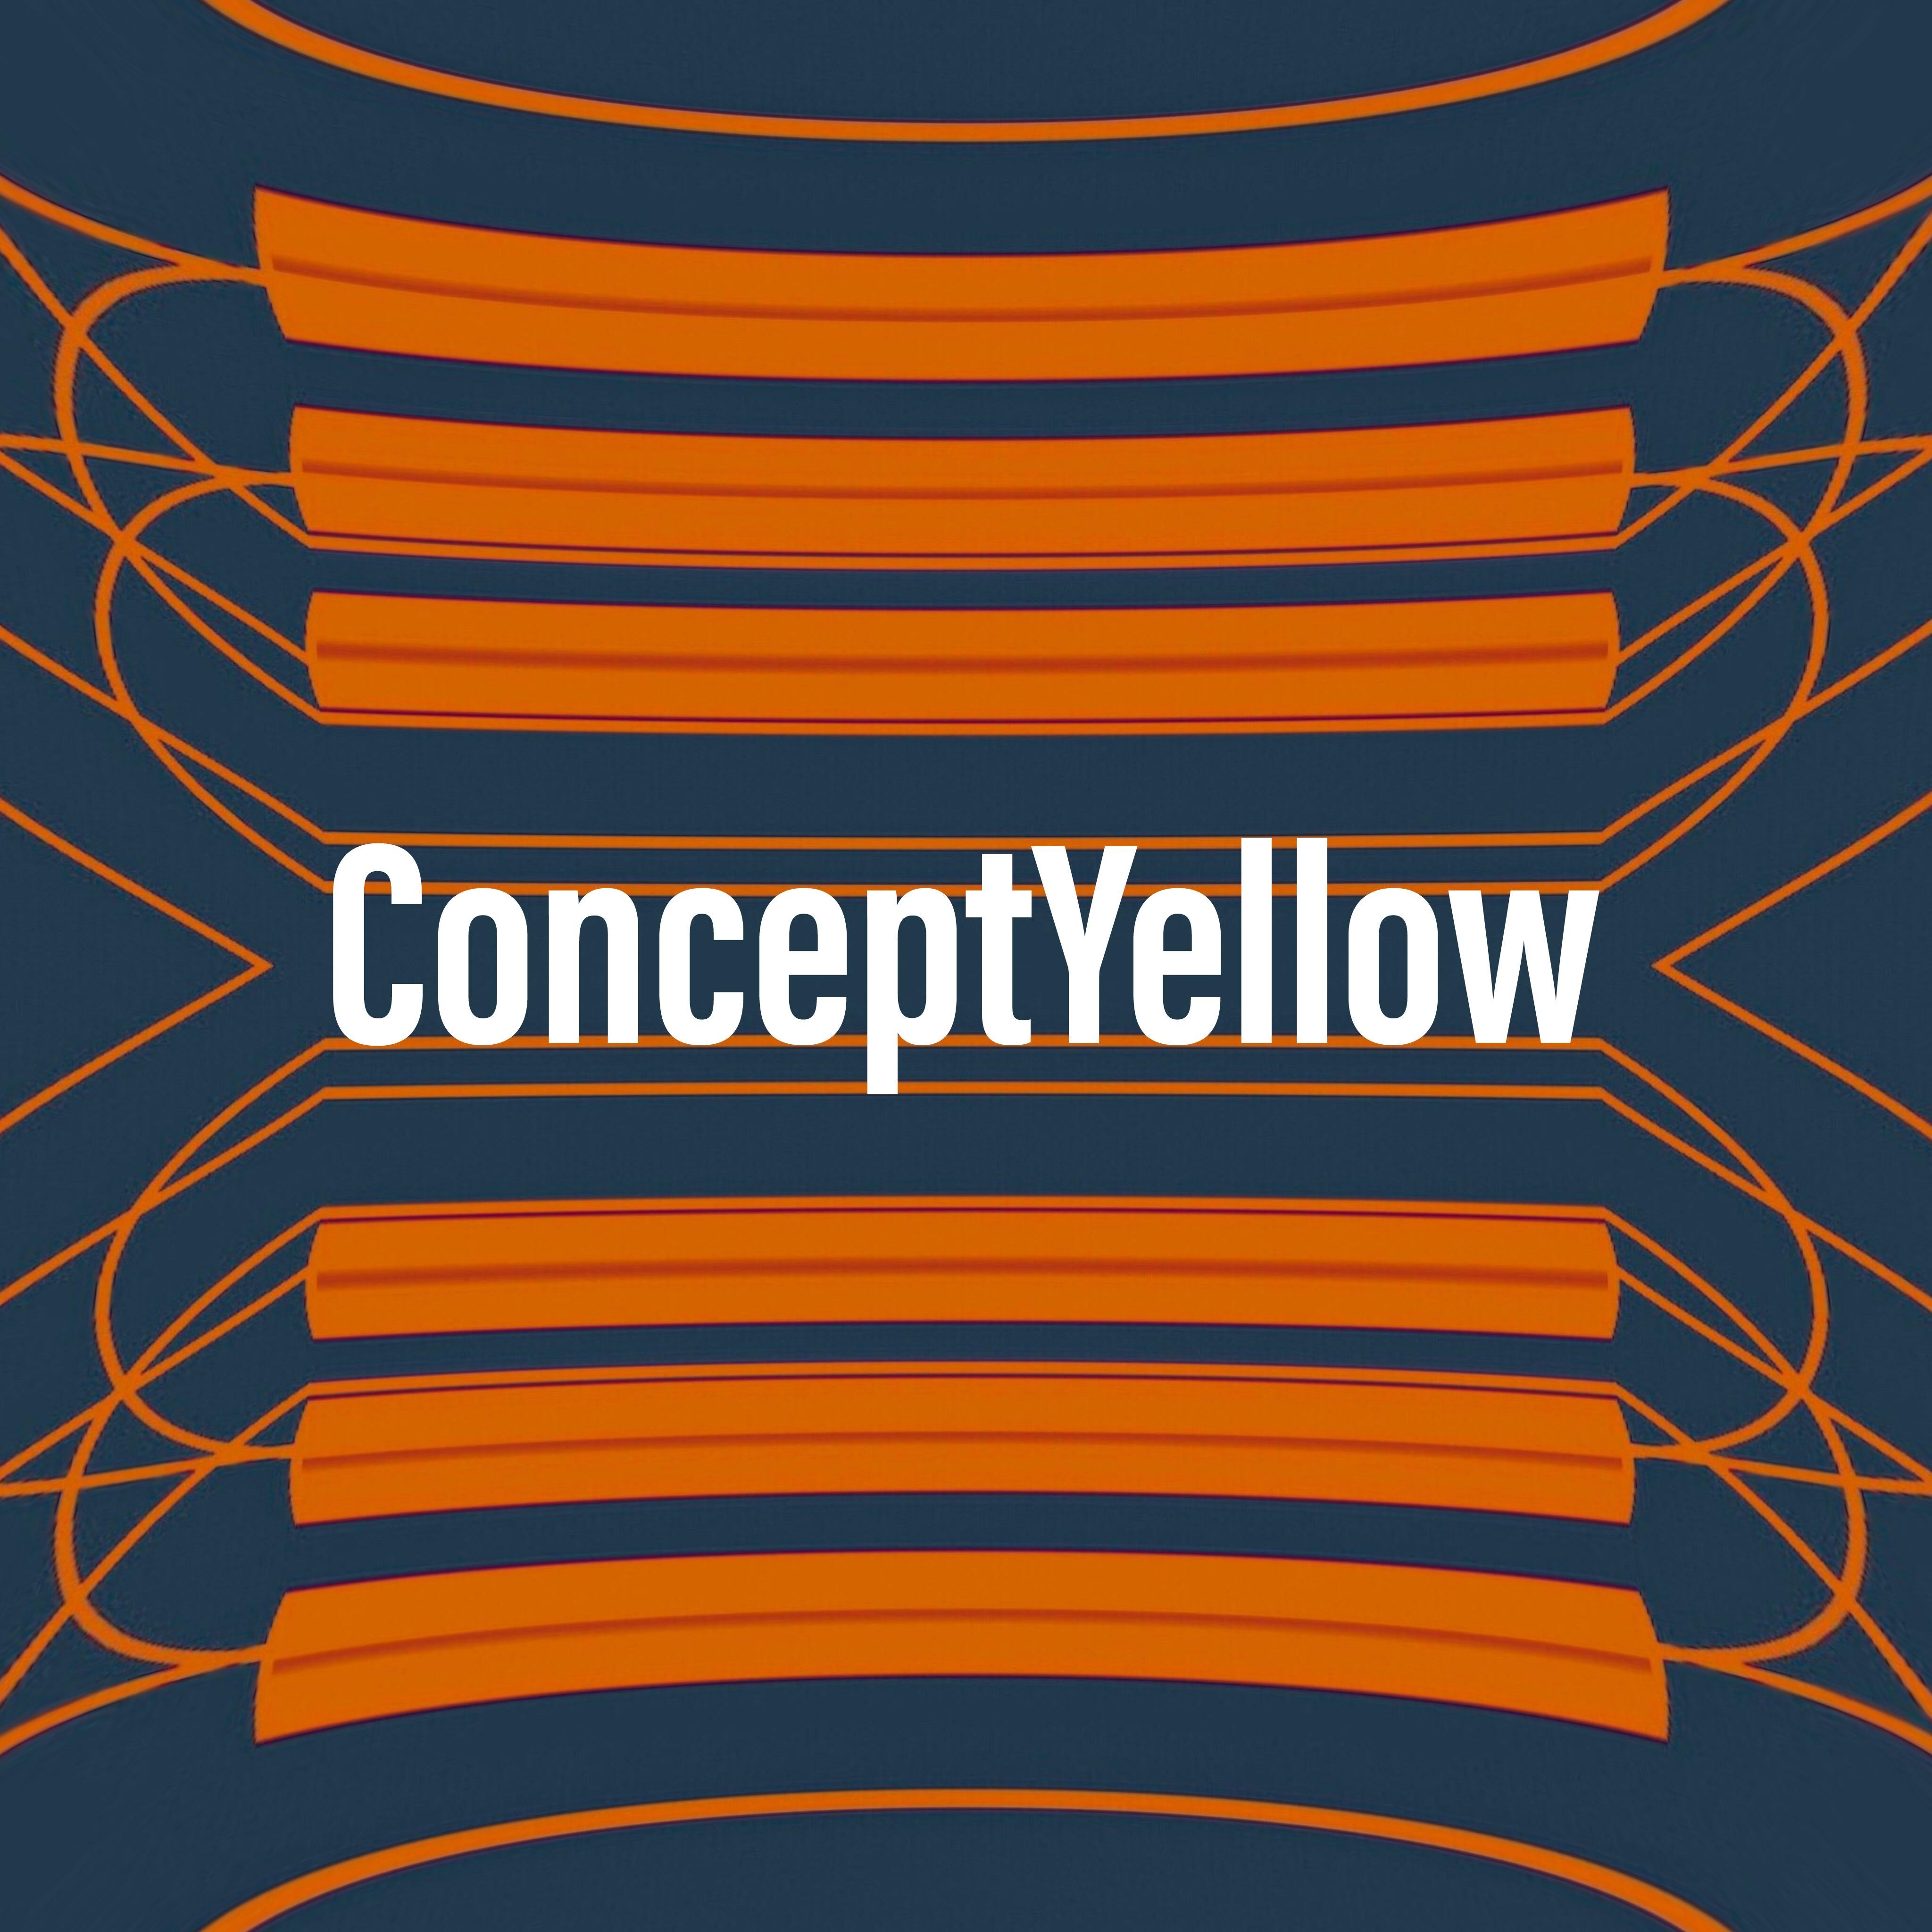 ConceptYellow